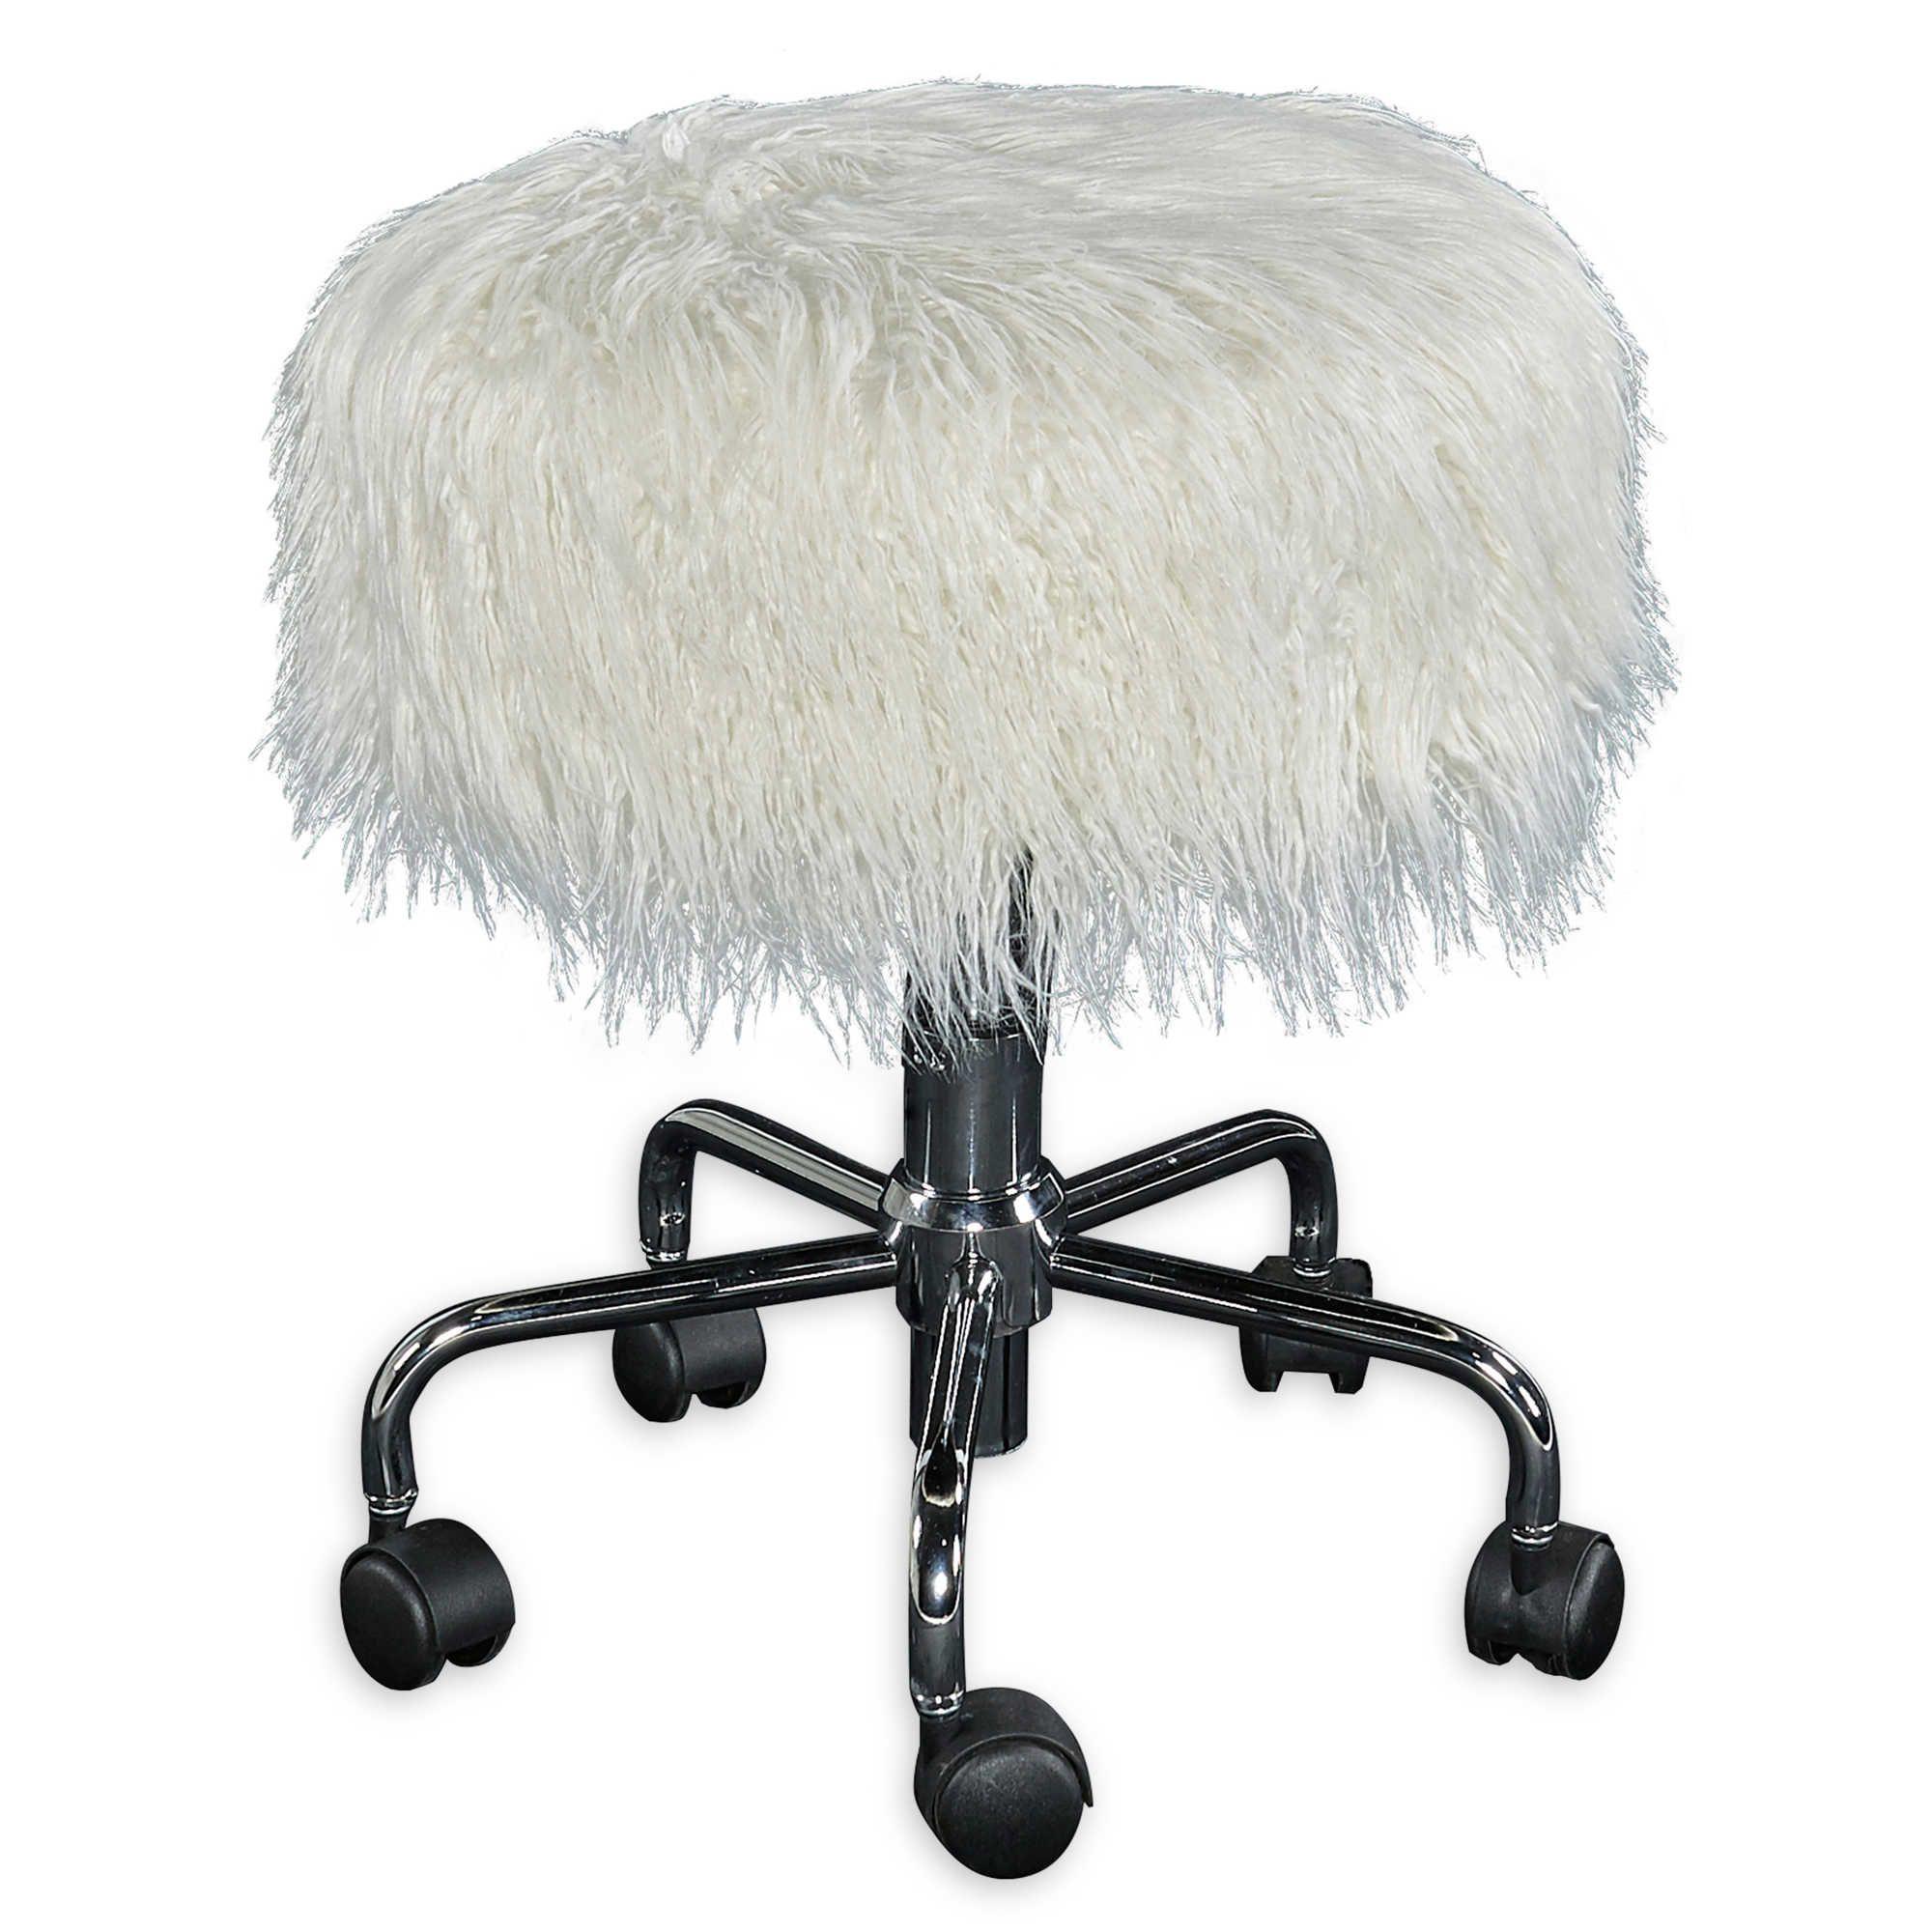 Ollie Faux Fur Rolling Swivel Stool In White Adjustable Stool